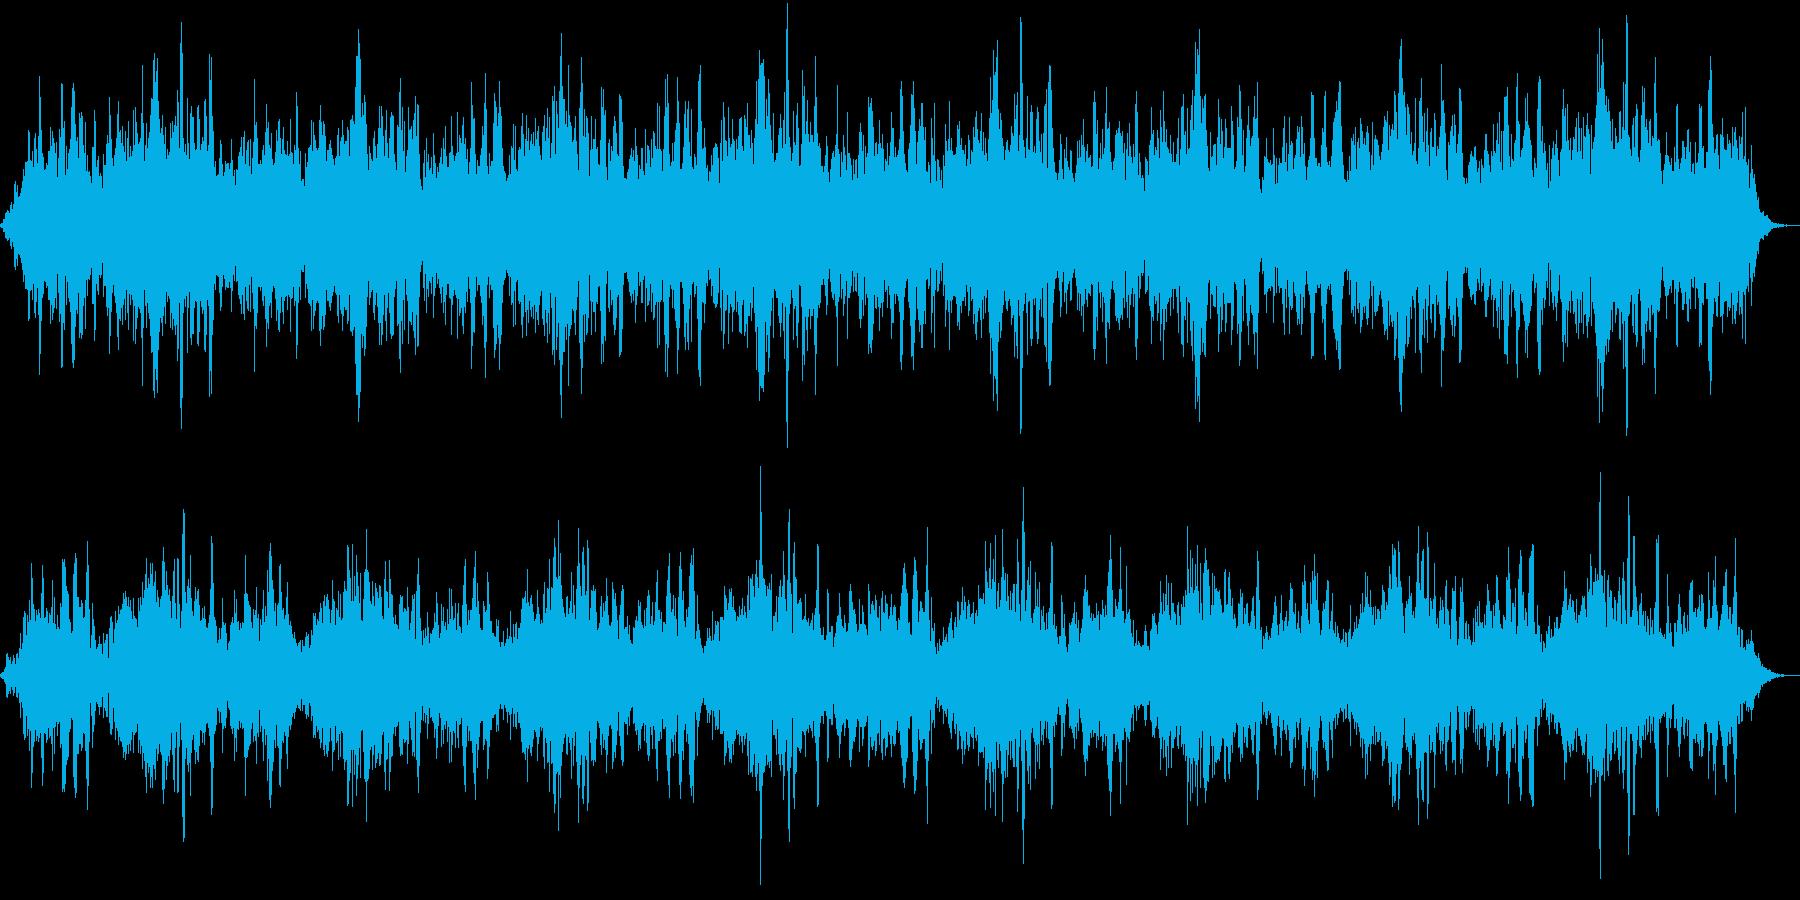 魔法詠唱、魔法発動、独白 06の再生済みの波形